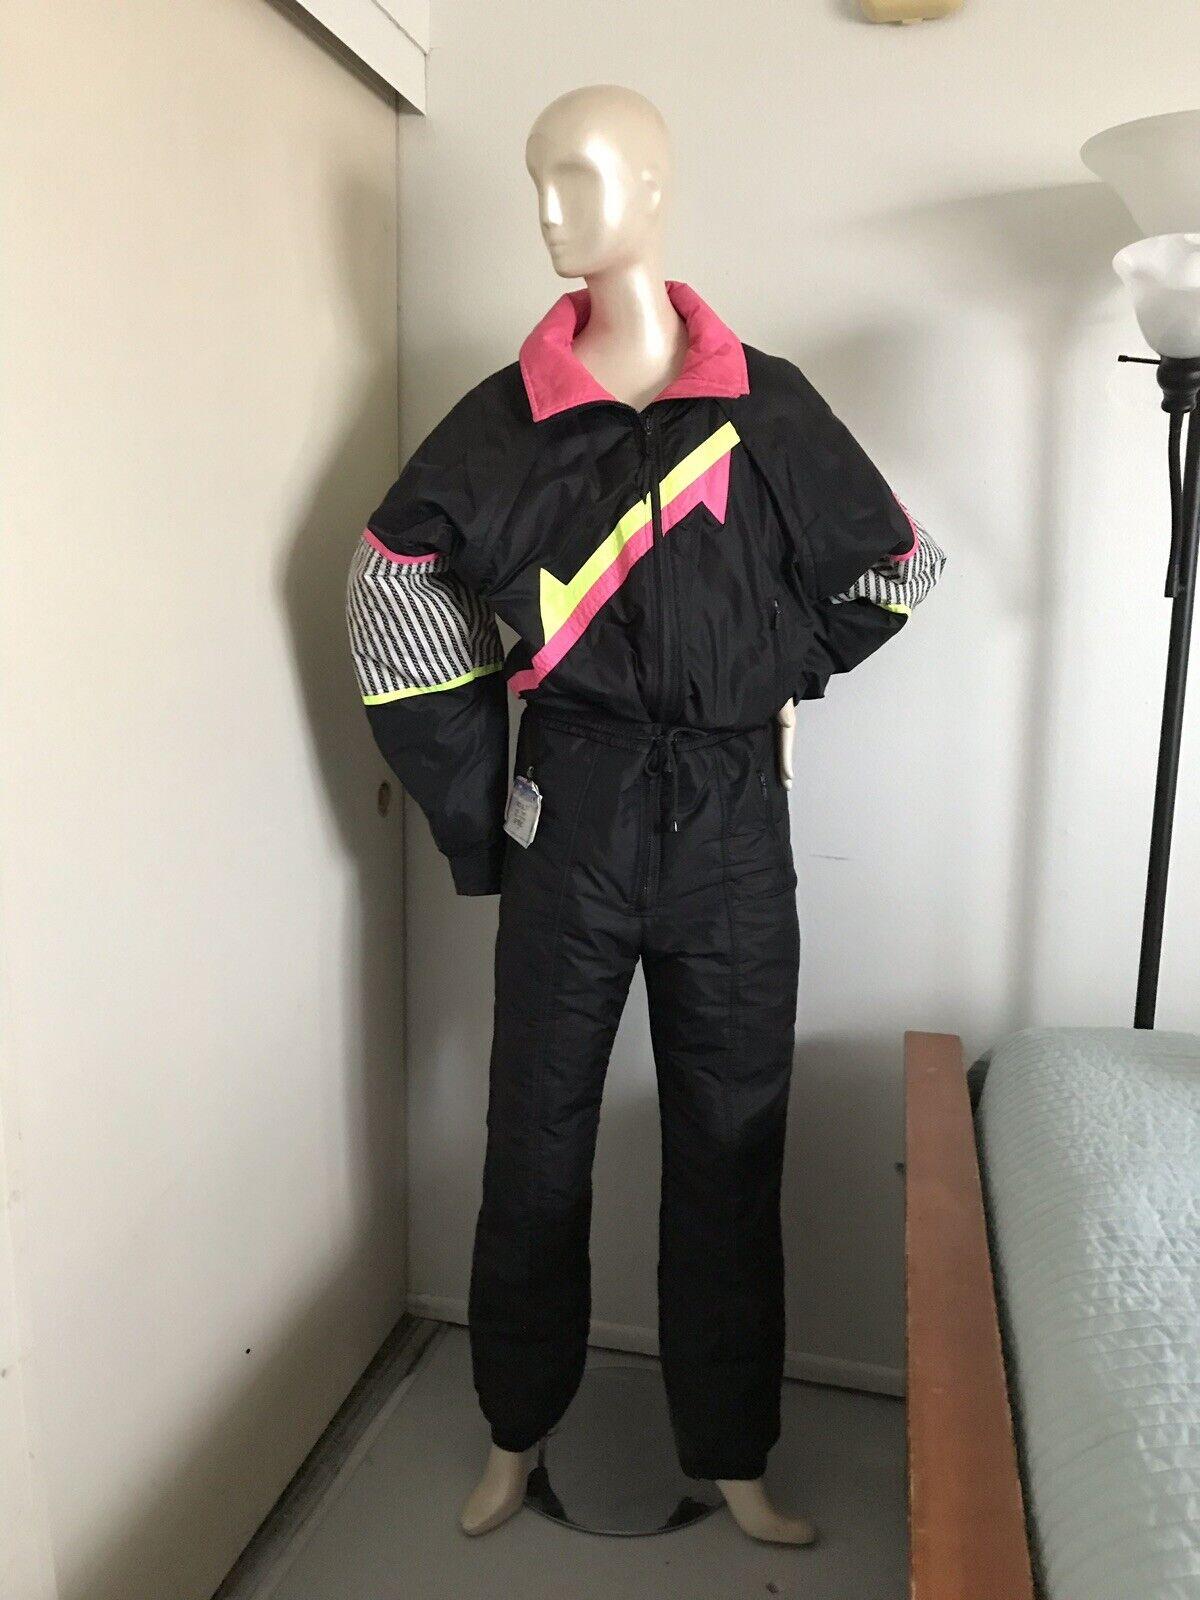 Vintage 80s 90s PEDIGREE One Piece SKI SUIT Snowsuit Größe 40